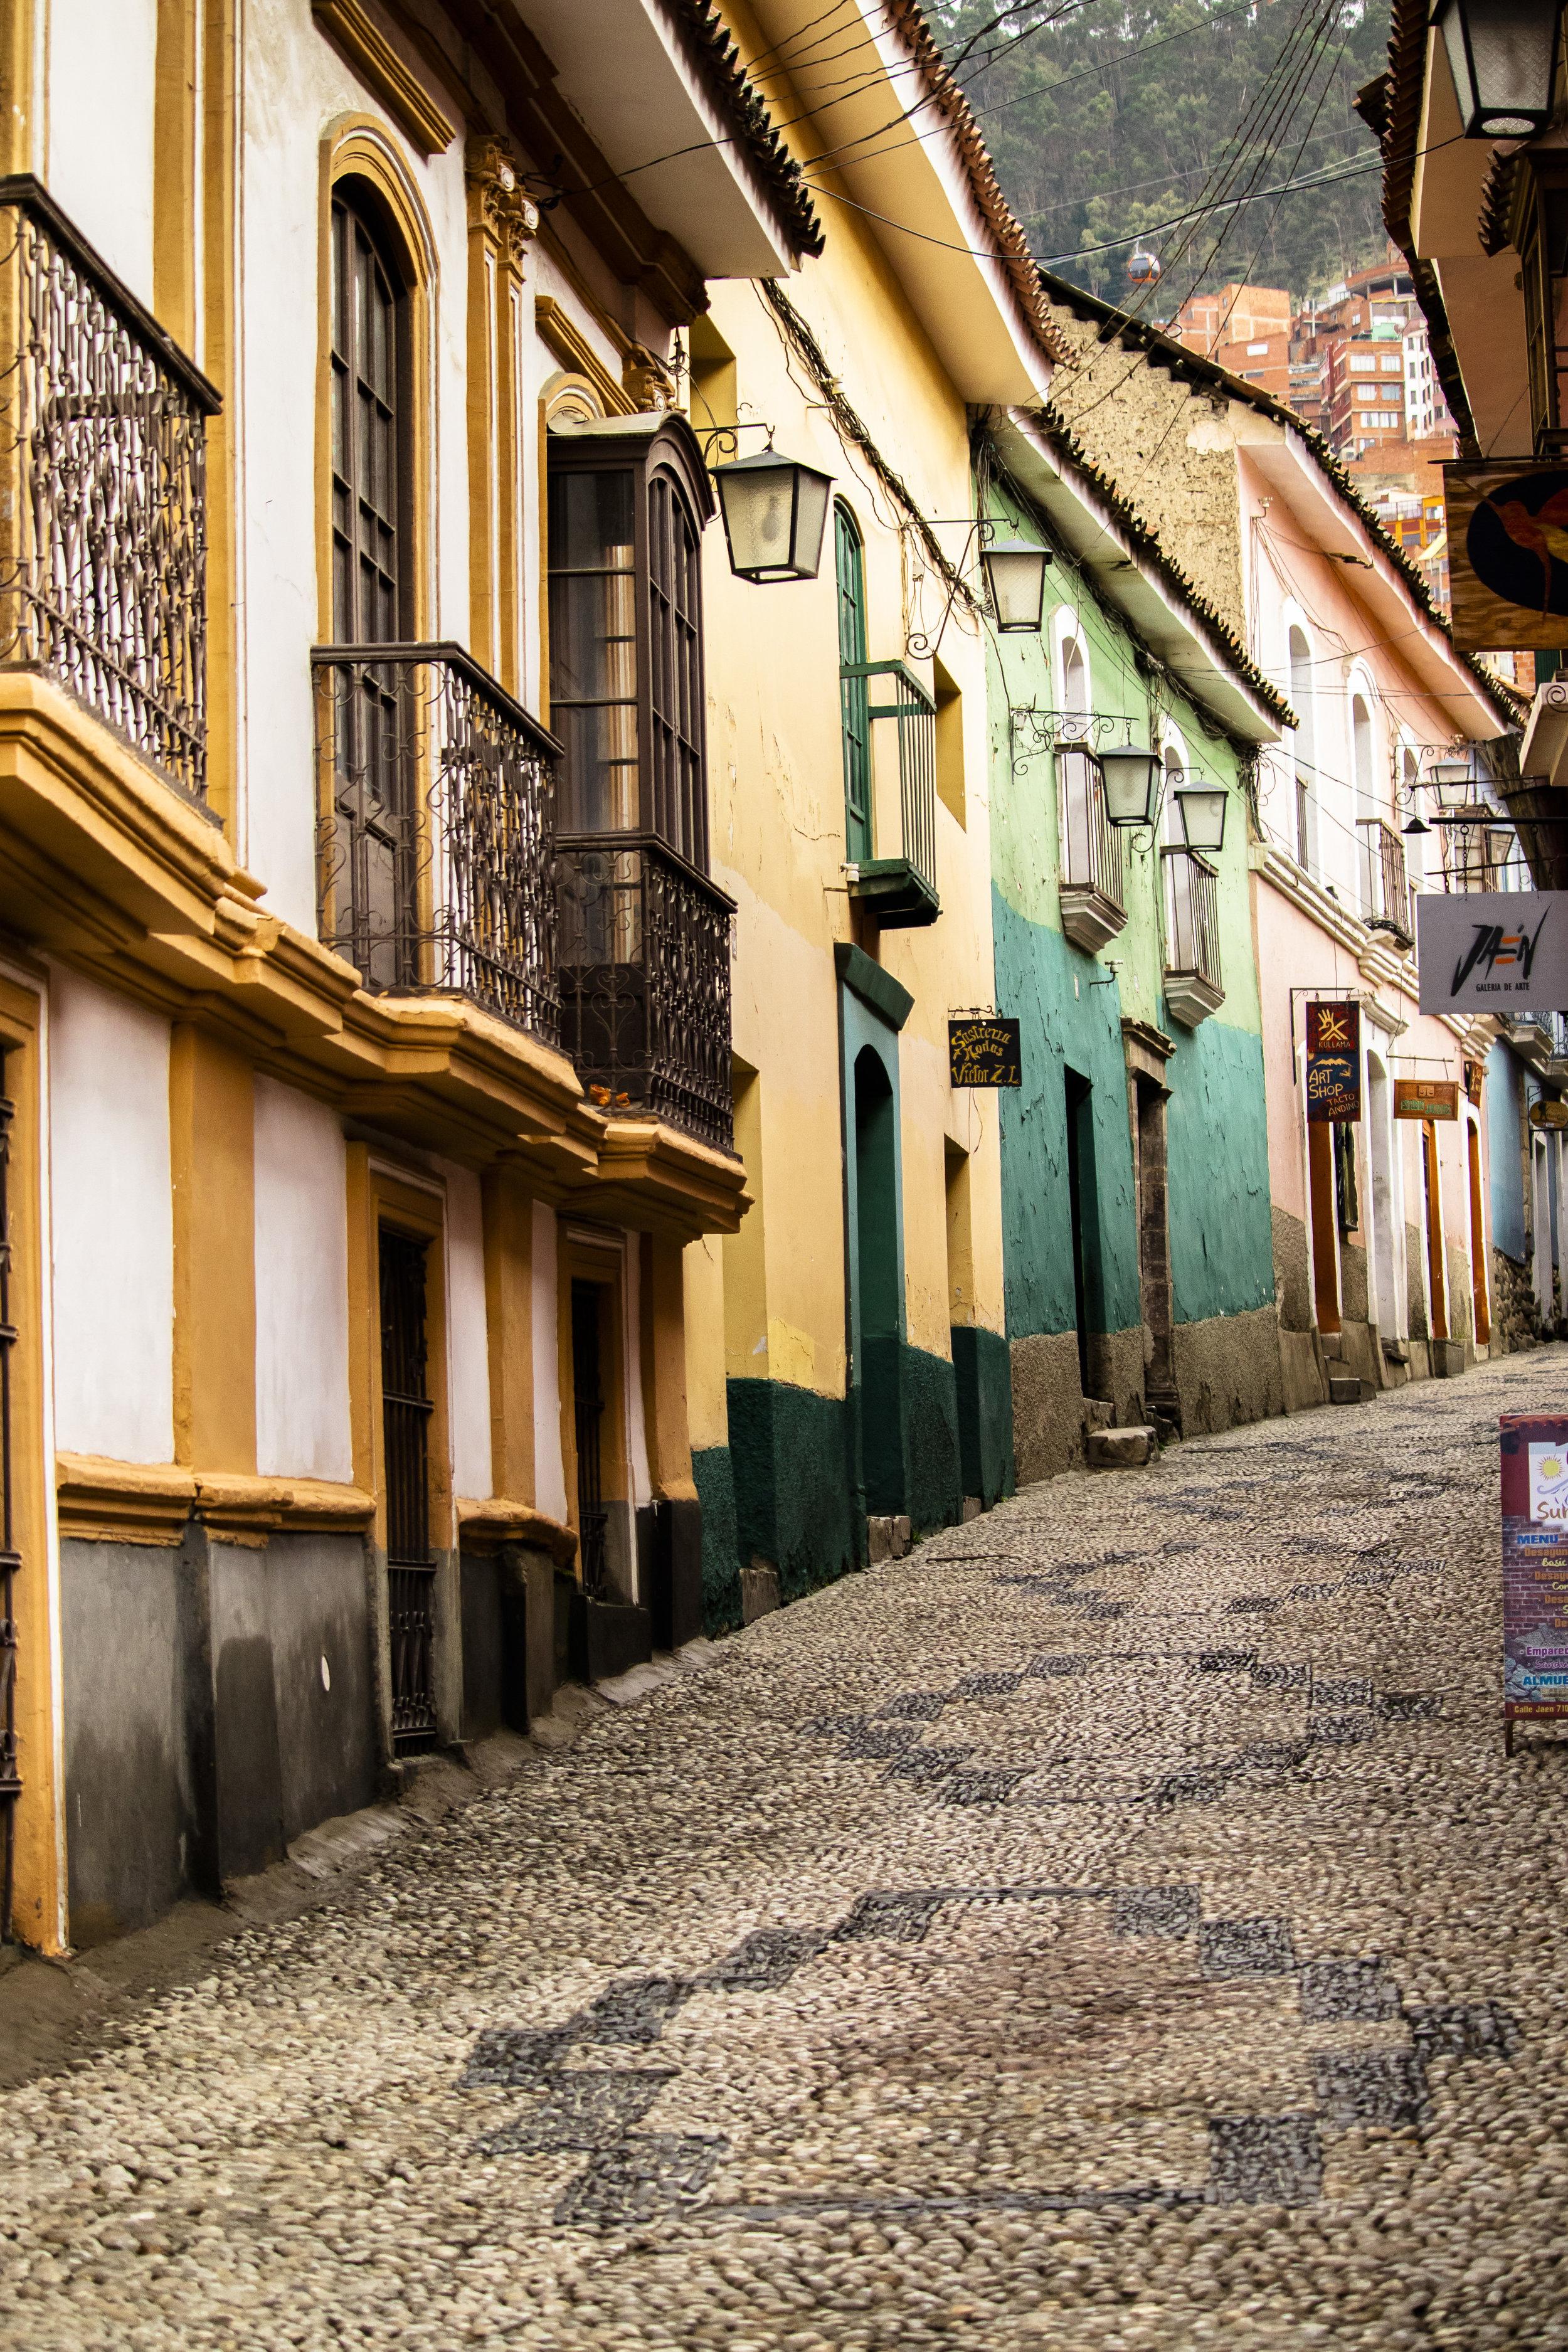 Colonial street still in tact in La Paz, Bolivia